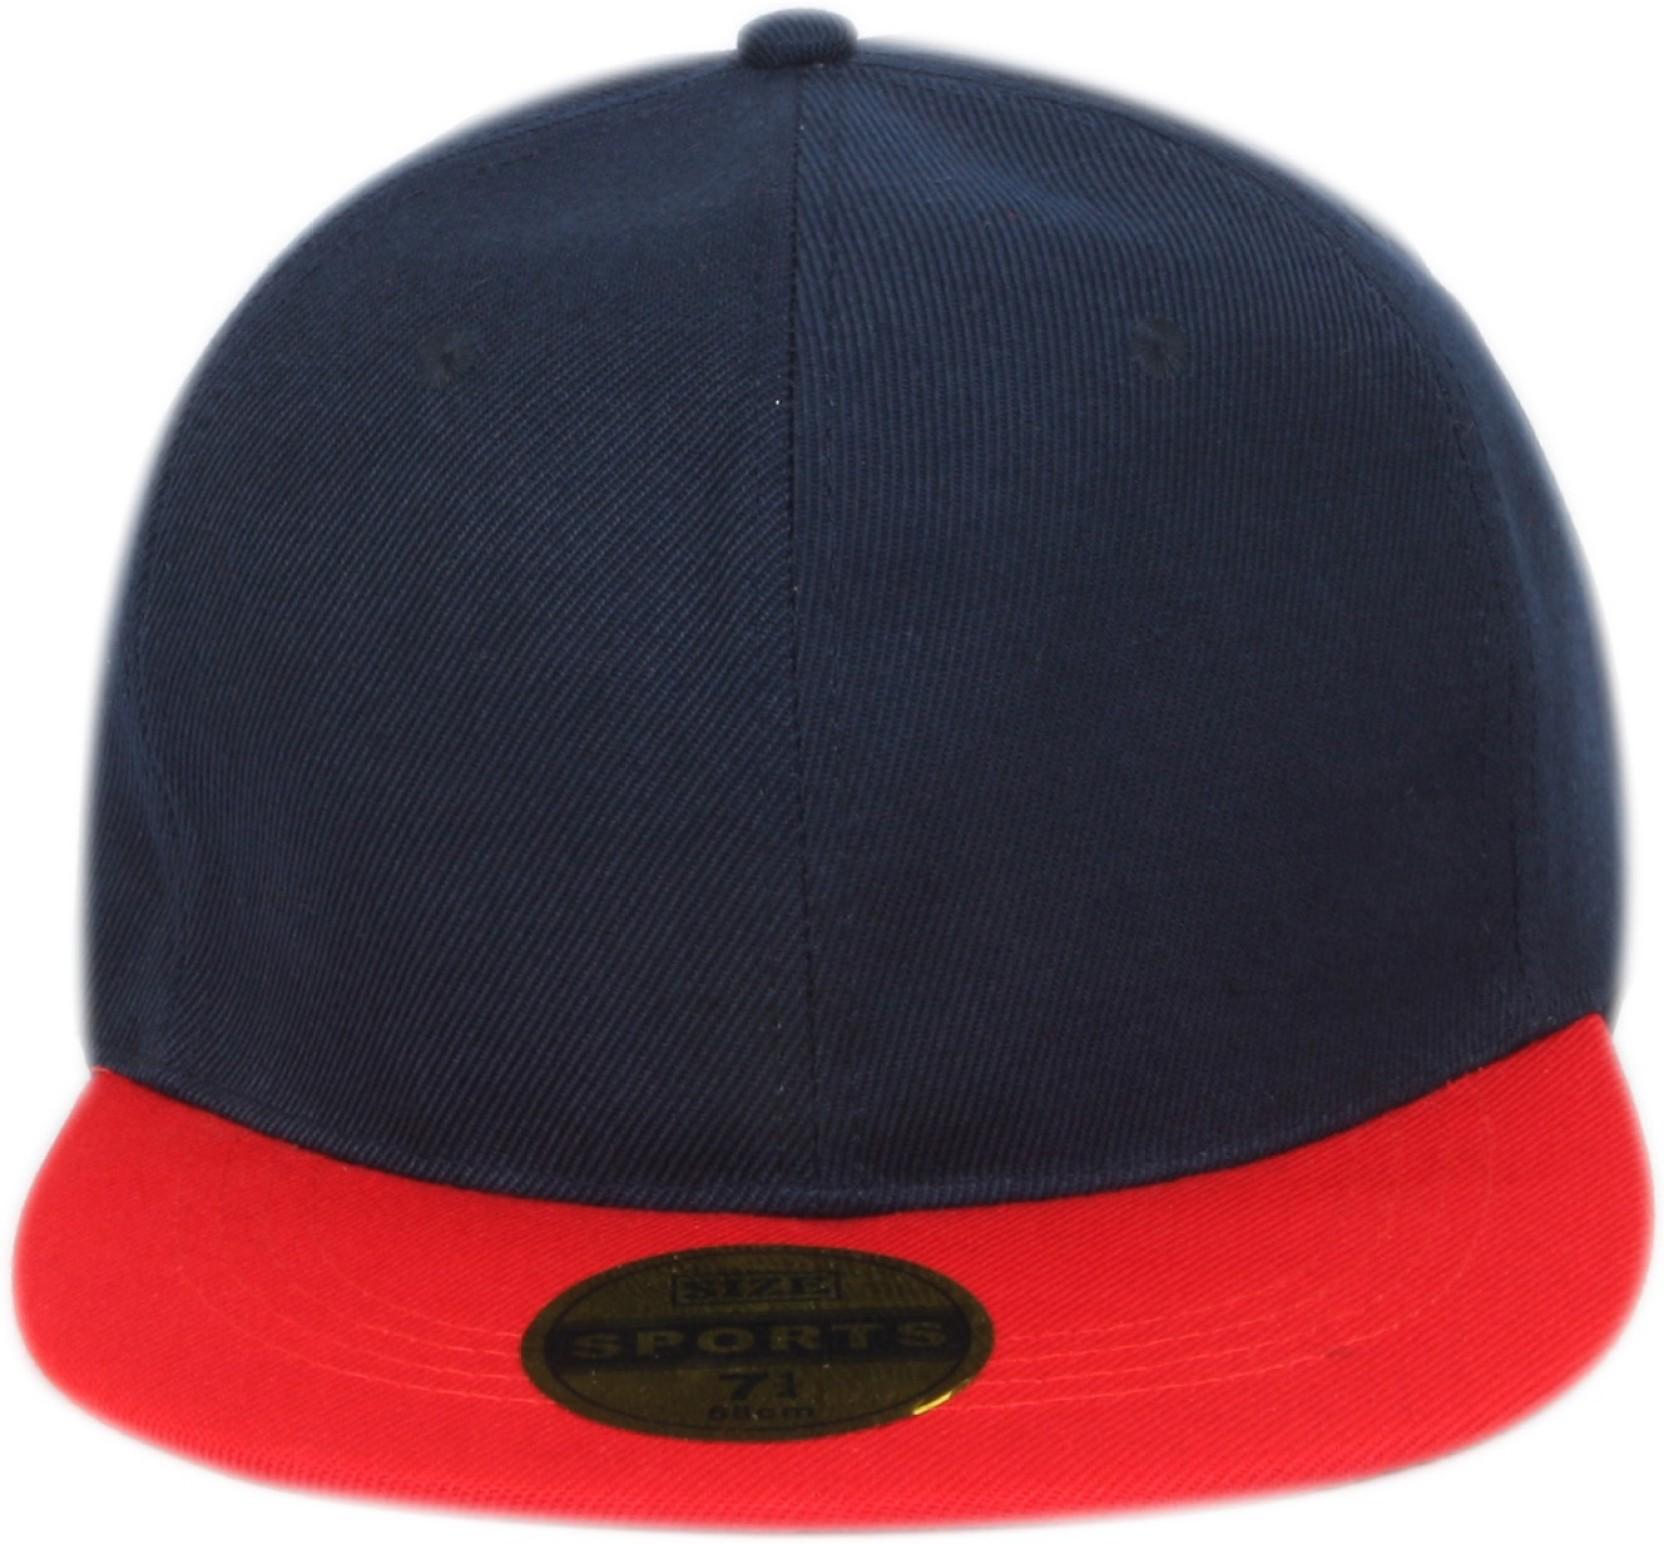 ddbb22eb7d3 ILU Caps for men and women